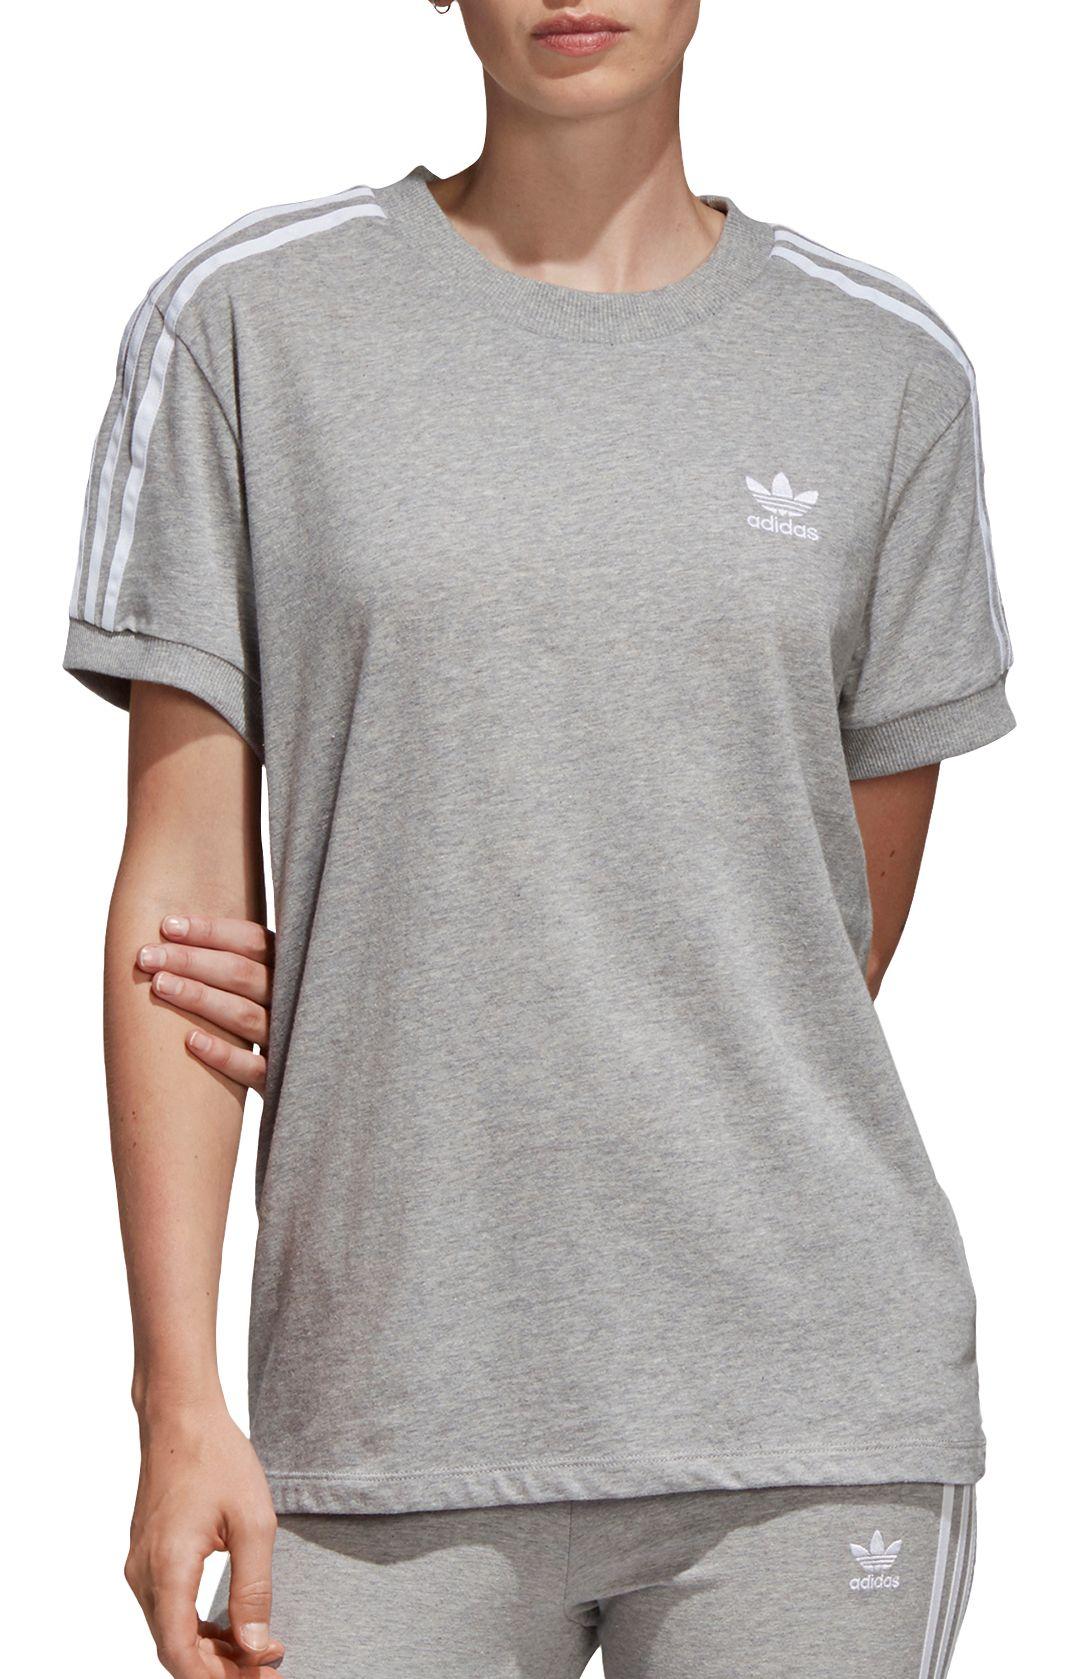 adidas Women's 3 Stripes T Shirt